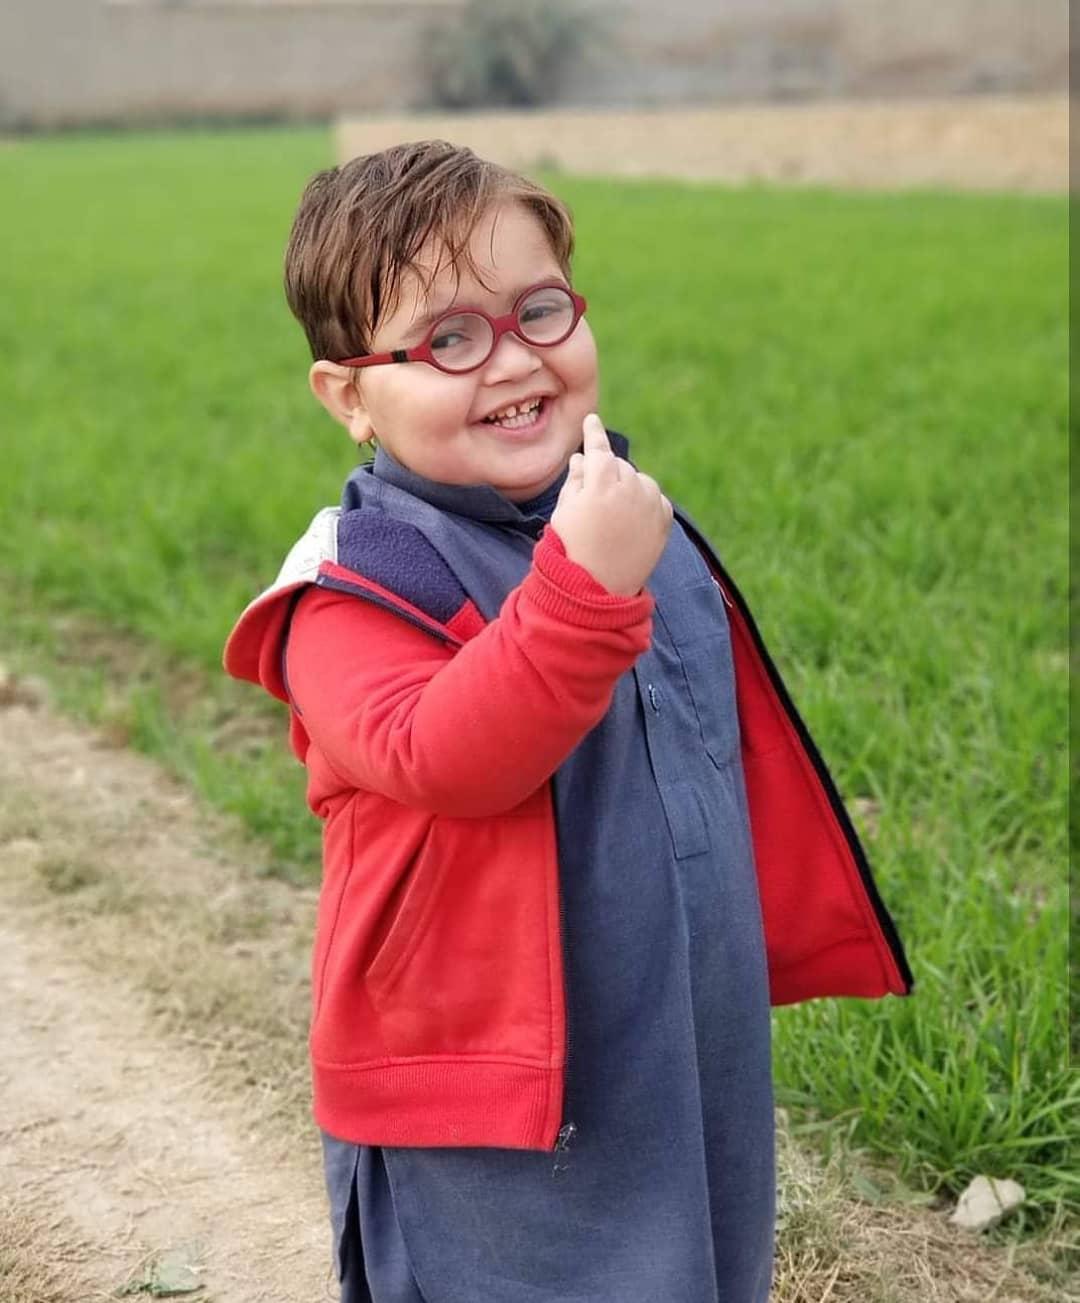 Ahmad Shah Cute Kid HD Photos In Red Jacket